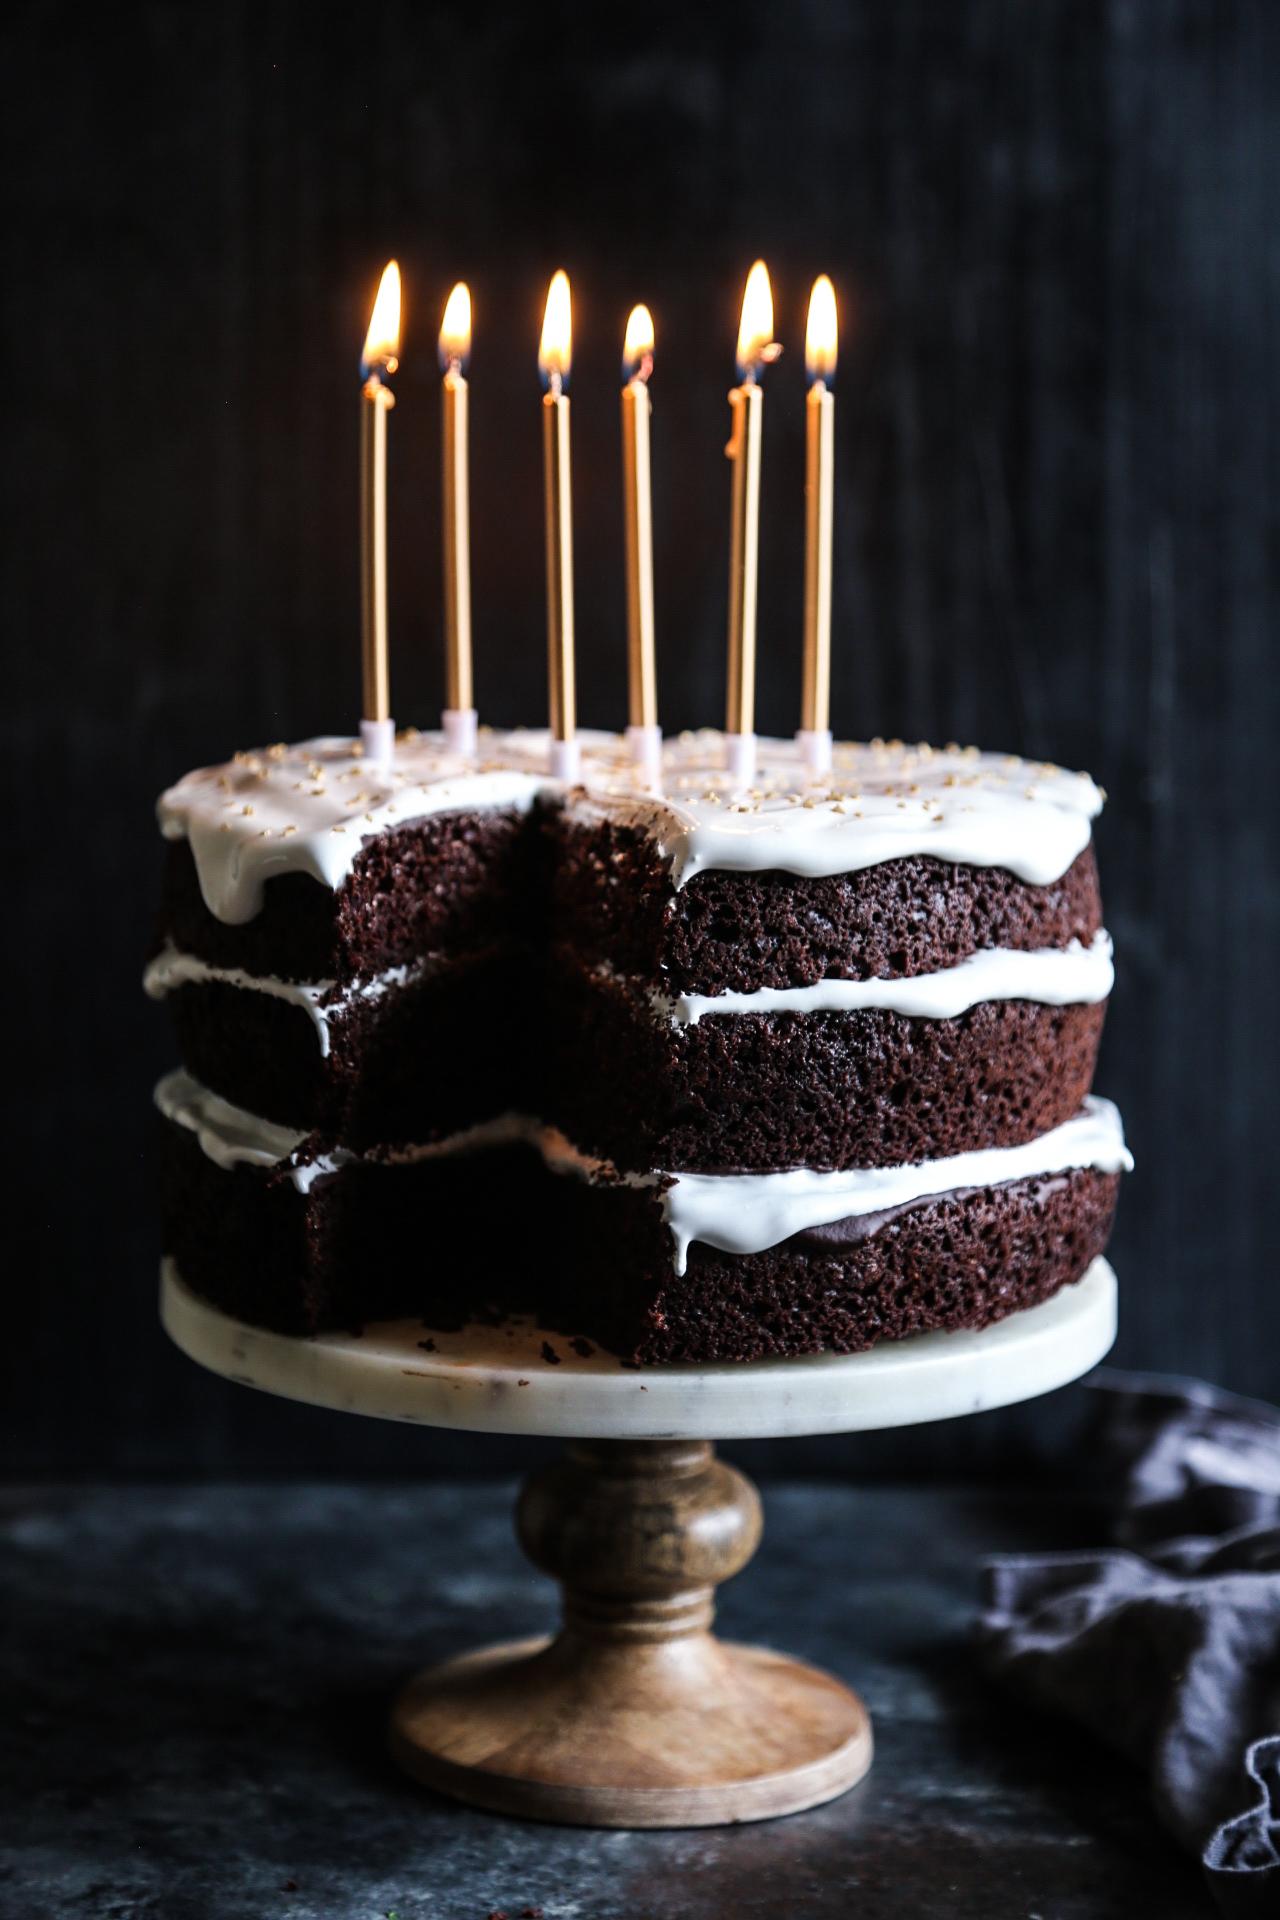 Groovy Ultimate Dark Chocolate Cake With Marshmallow Frosting Climbing Funny Birthday Cards Online Necthendildamsfinfo